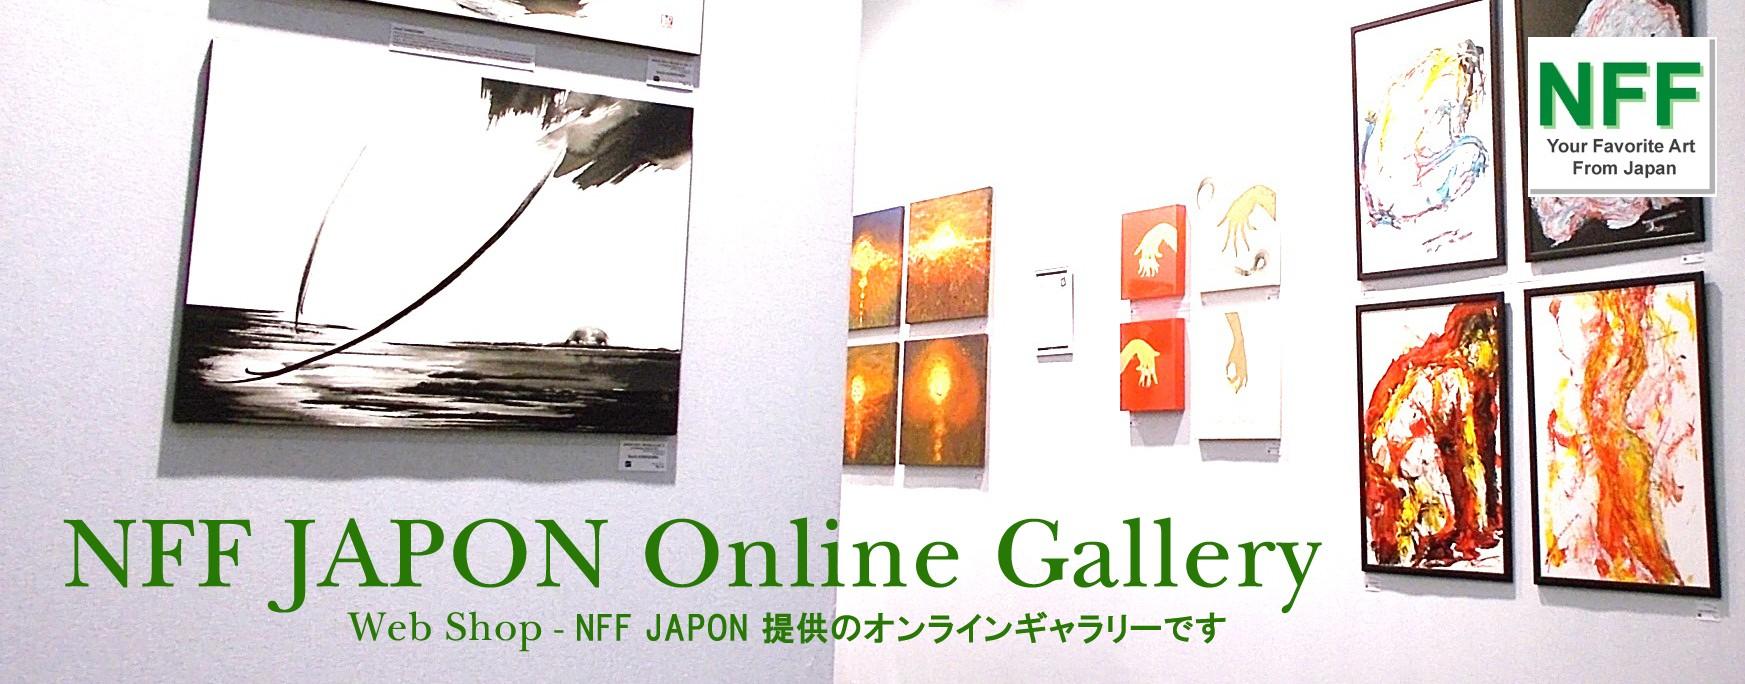 NFF JAPON Online Gallery